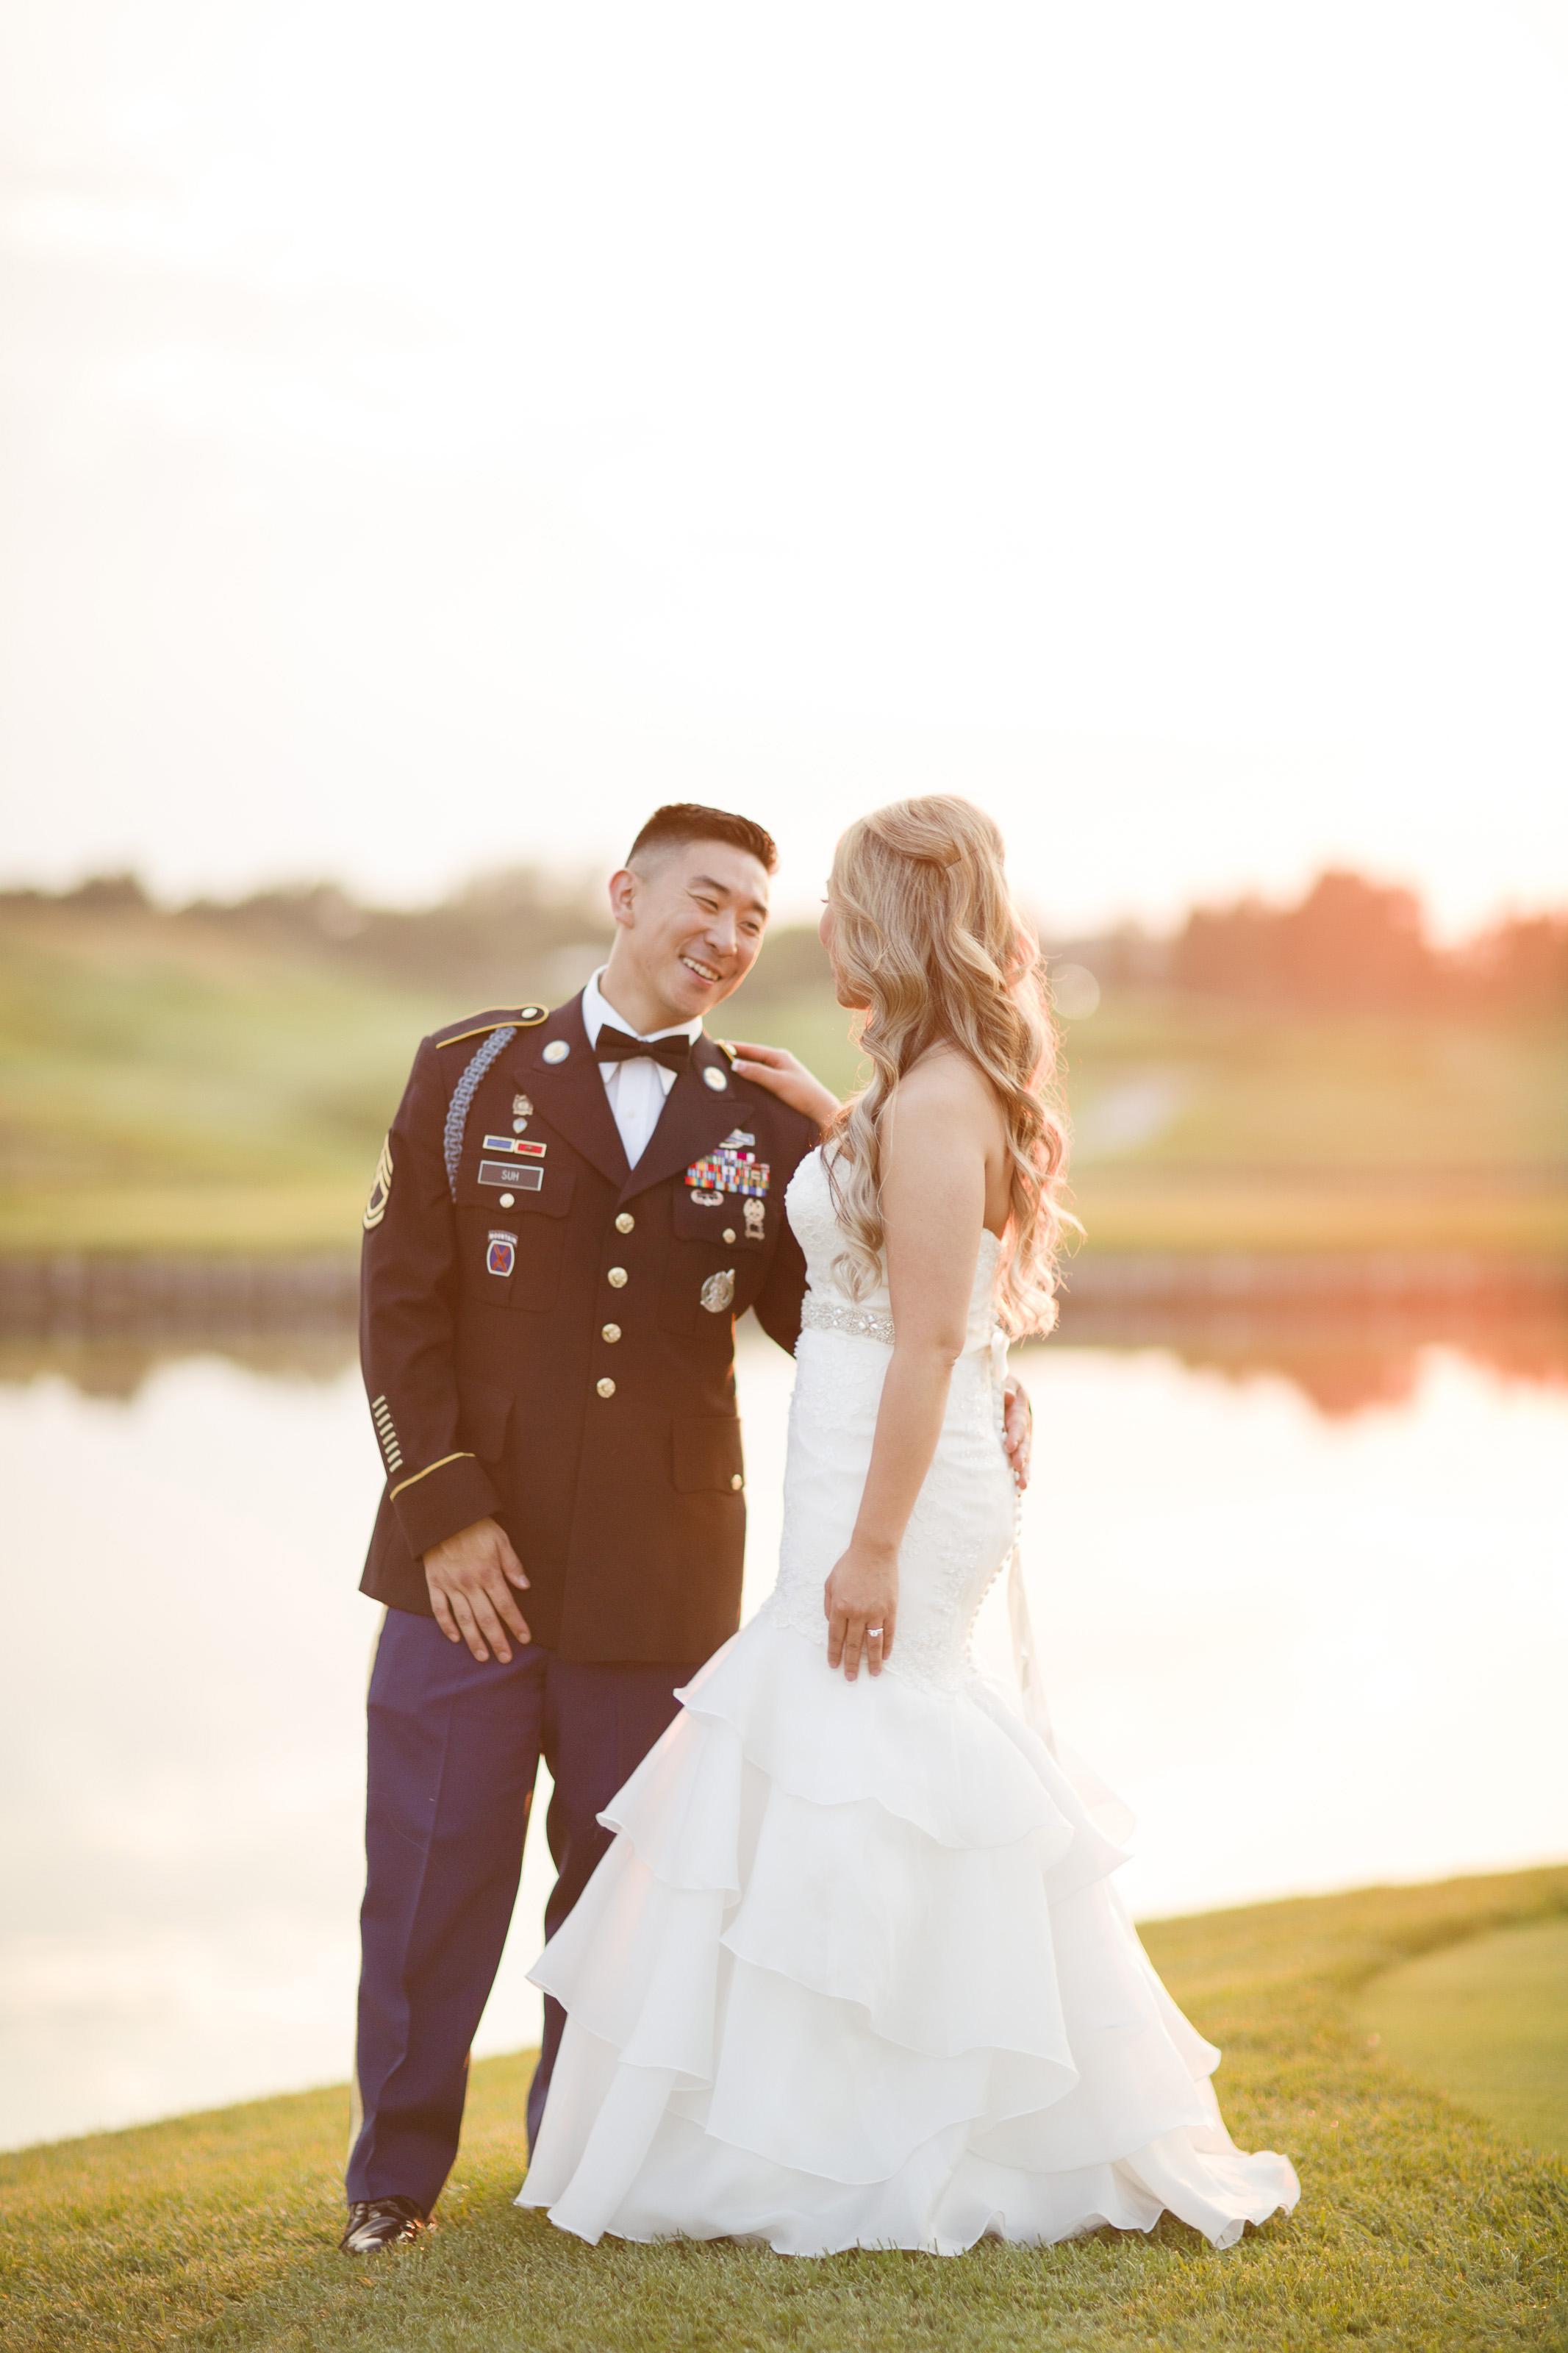 kristen-vance-glenmoor-country-club-cherry-hills-colorado-wedding-3.jpg